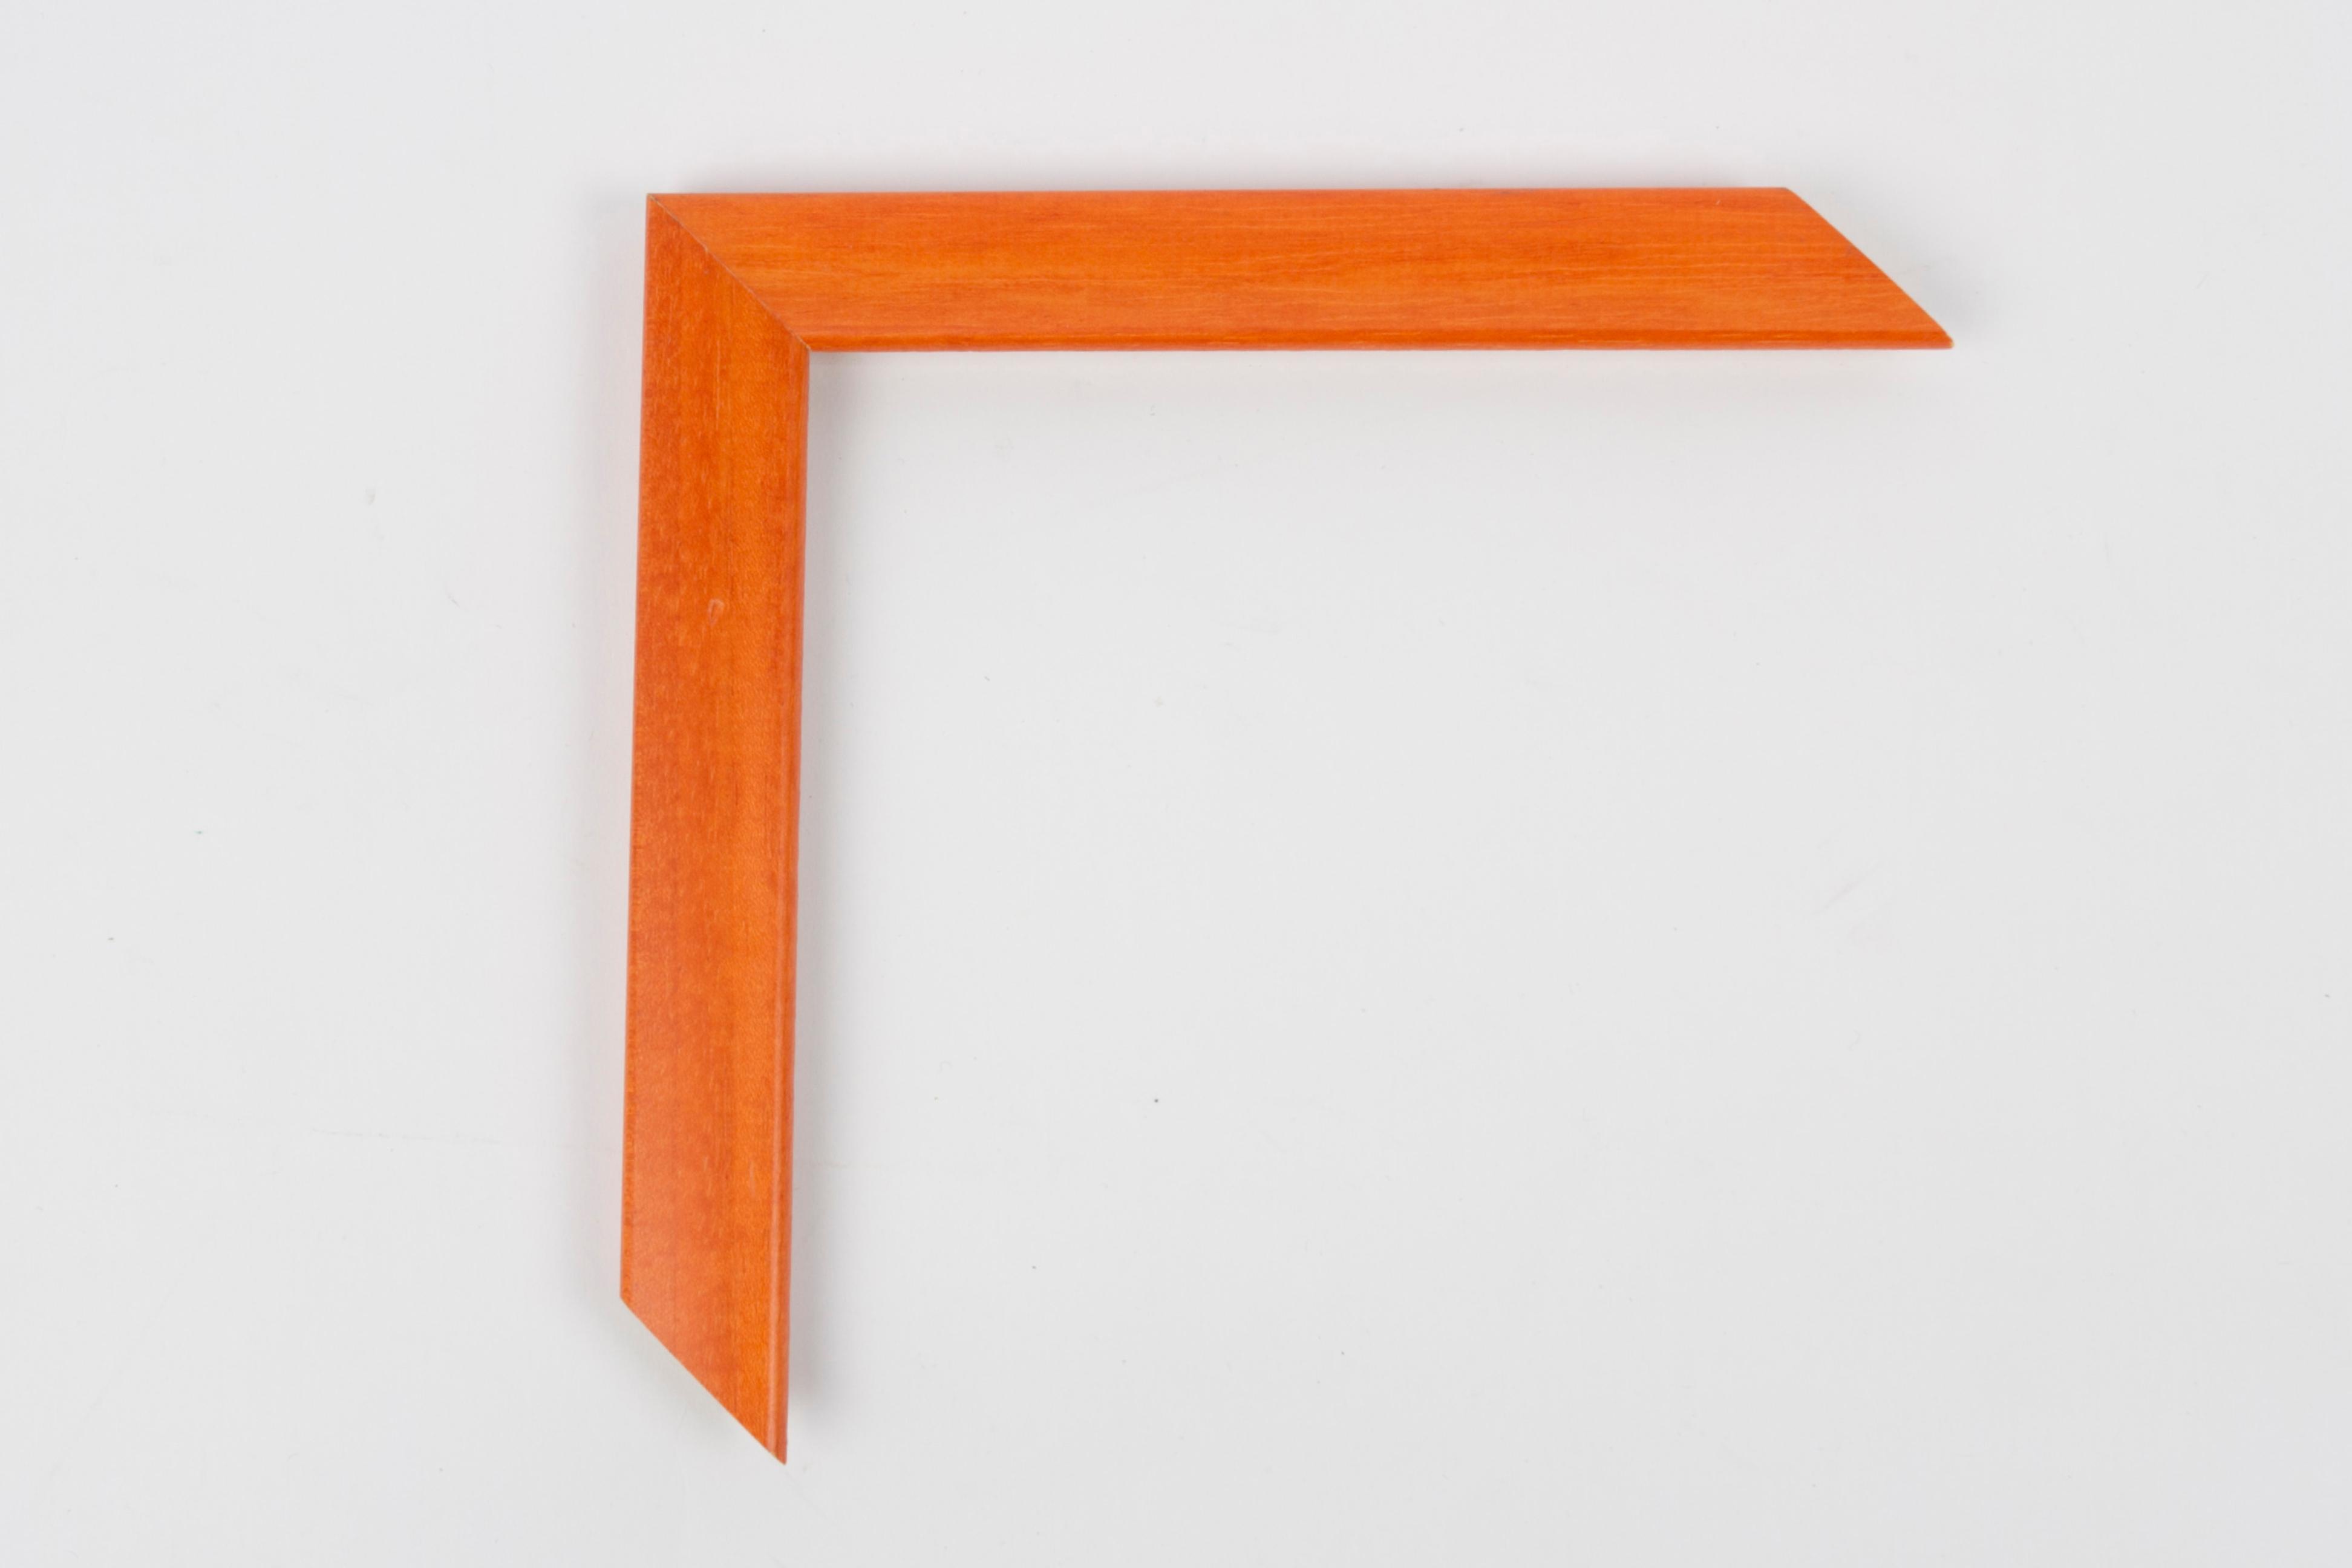 04144-112-ancho2,9cm